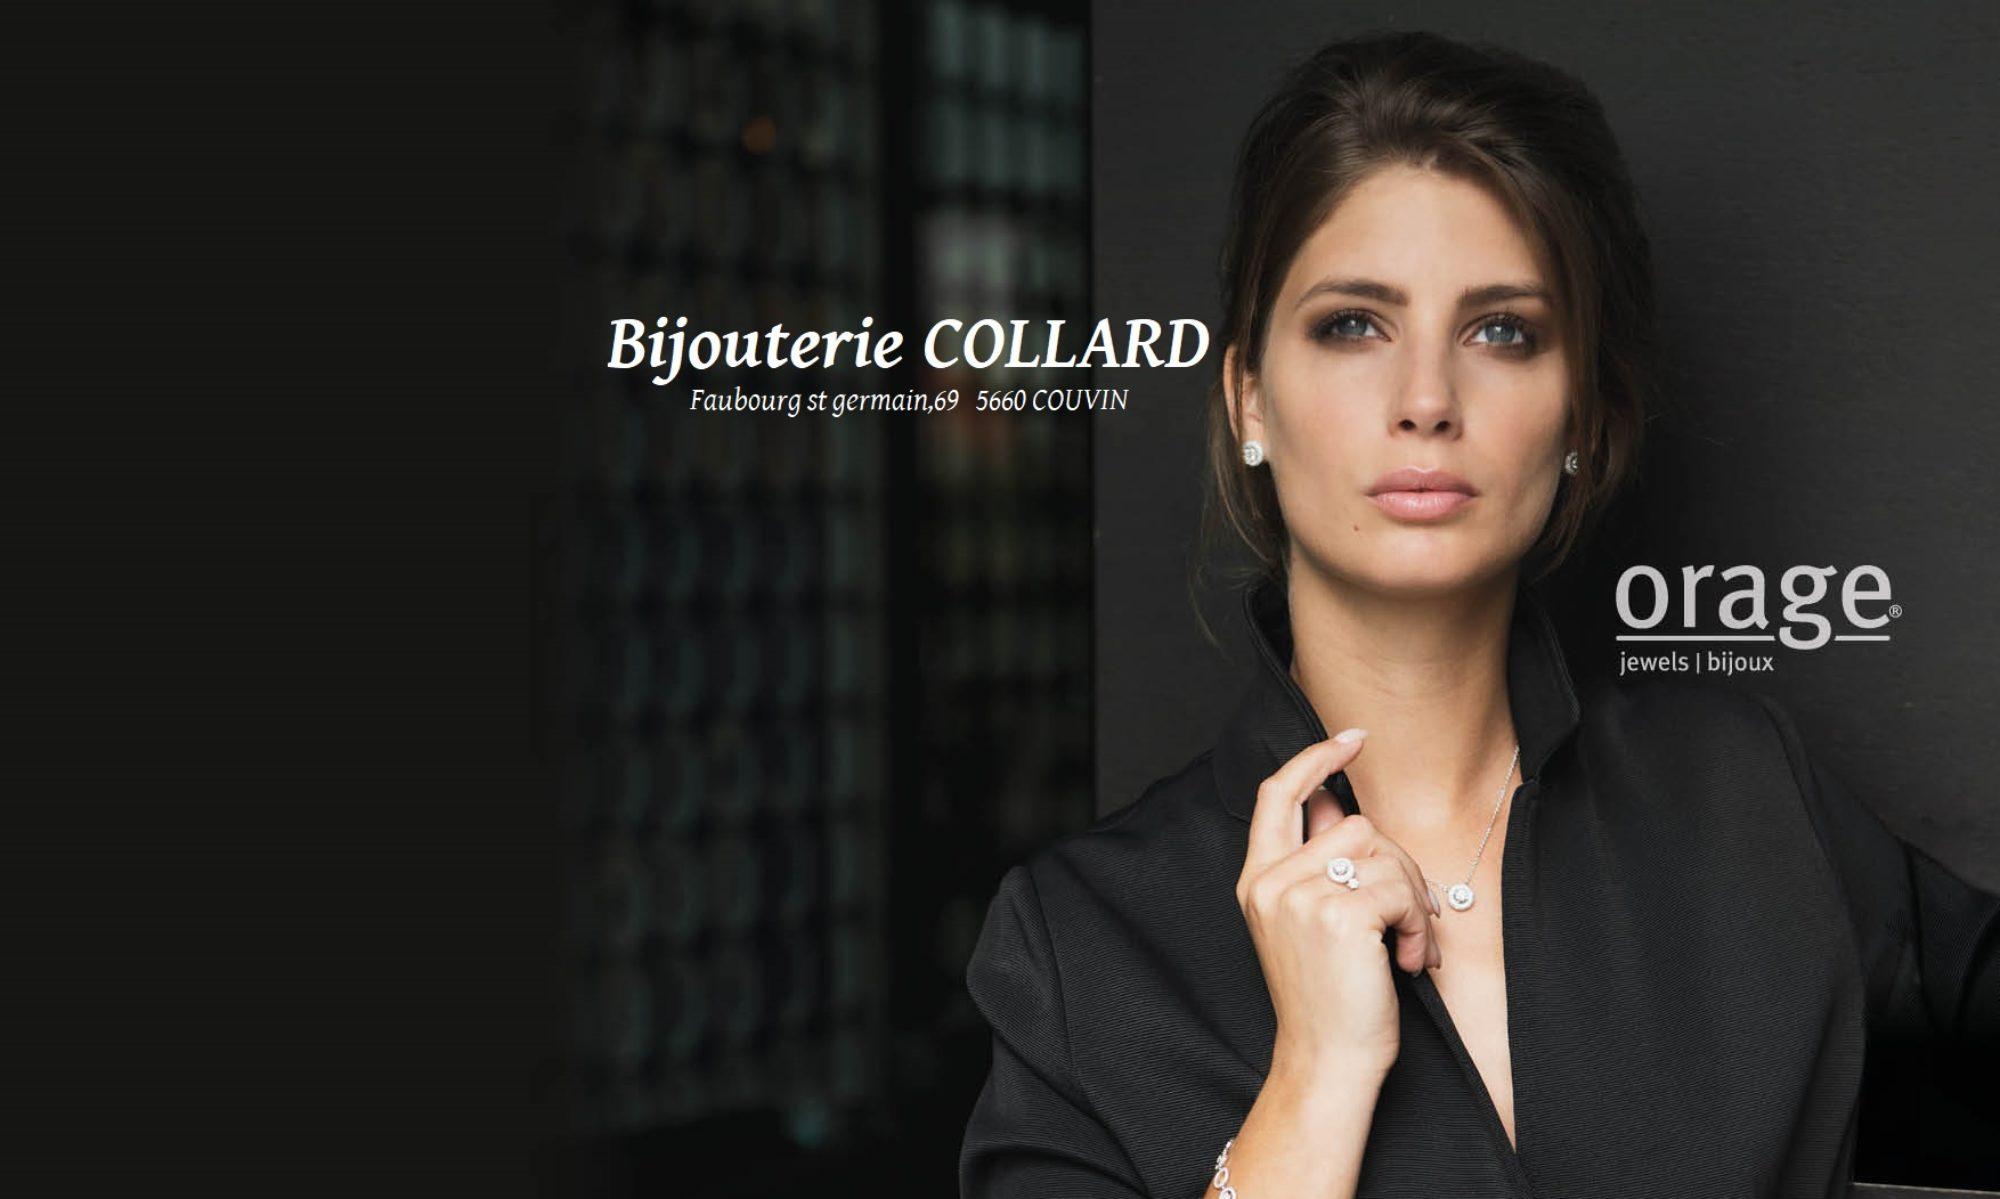 Bijouterie COLLARD